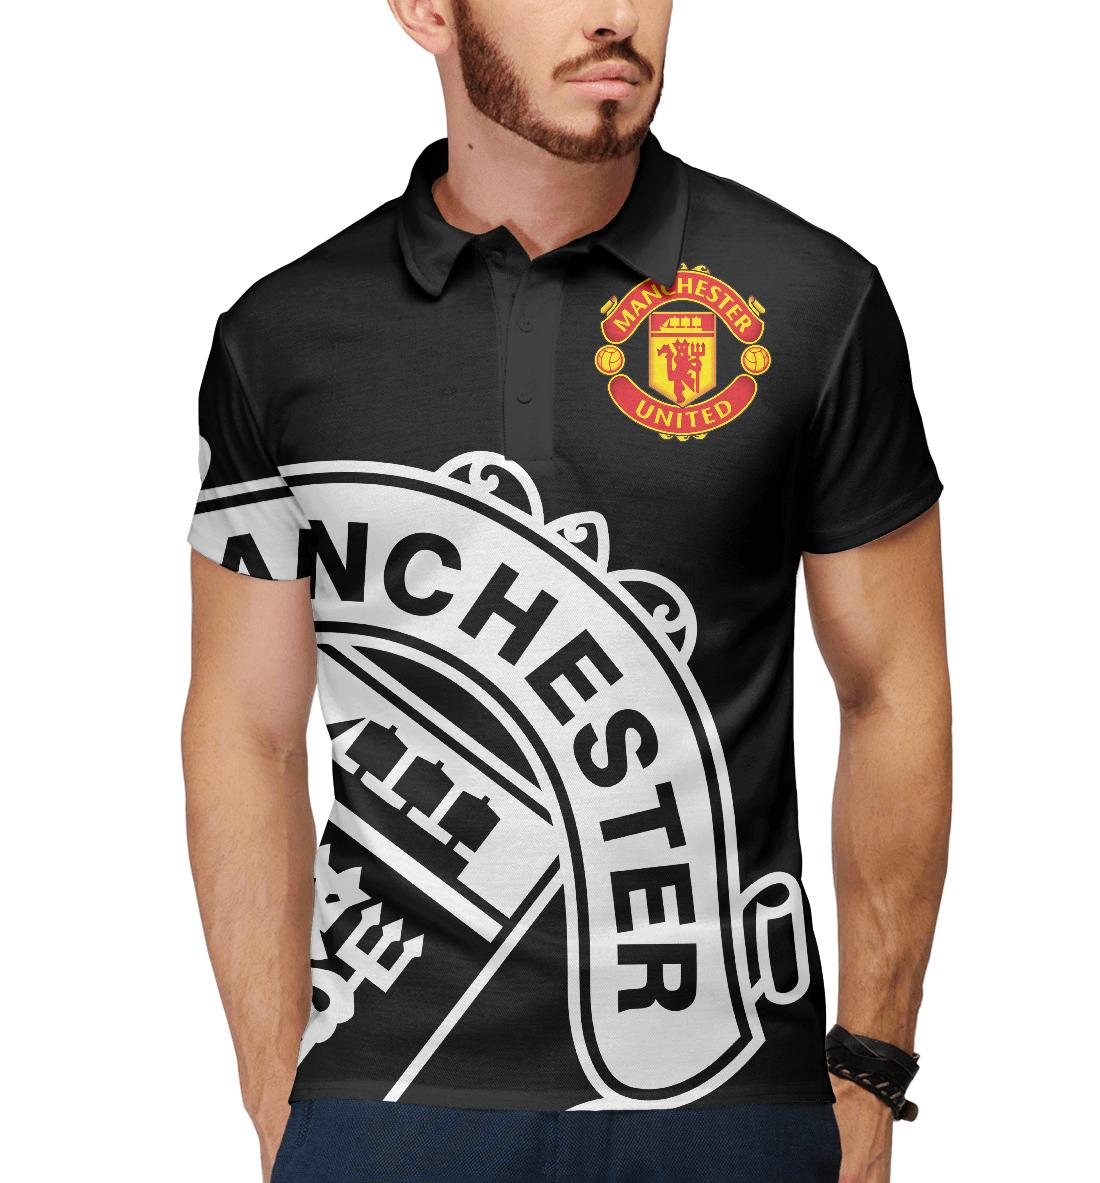 Купить Манчестер Юнайтед, Printbar, Поло, MAN-361388-pol-2